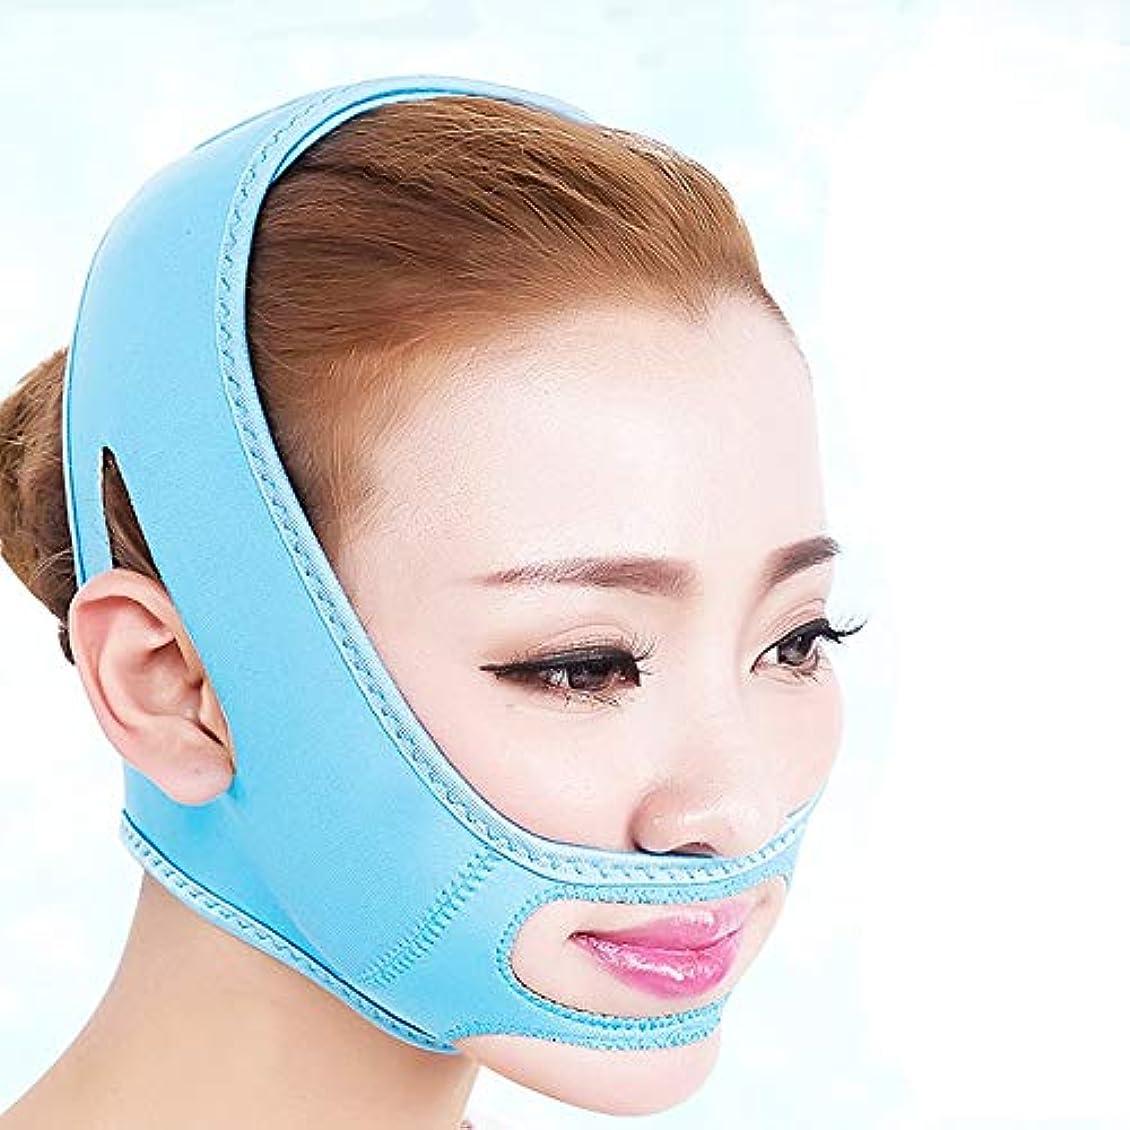 Vラインマスク、ネックマスクフェイスリフトVリフティングチンアップパッチダブルチンリデューサーネックリフト,Blue